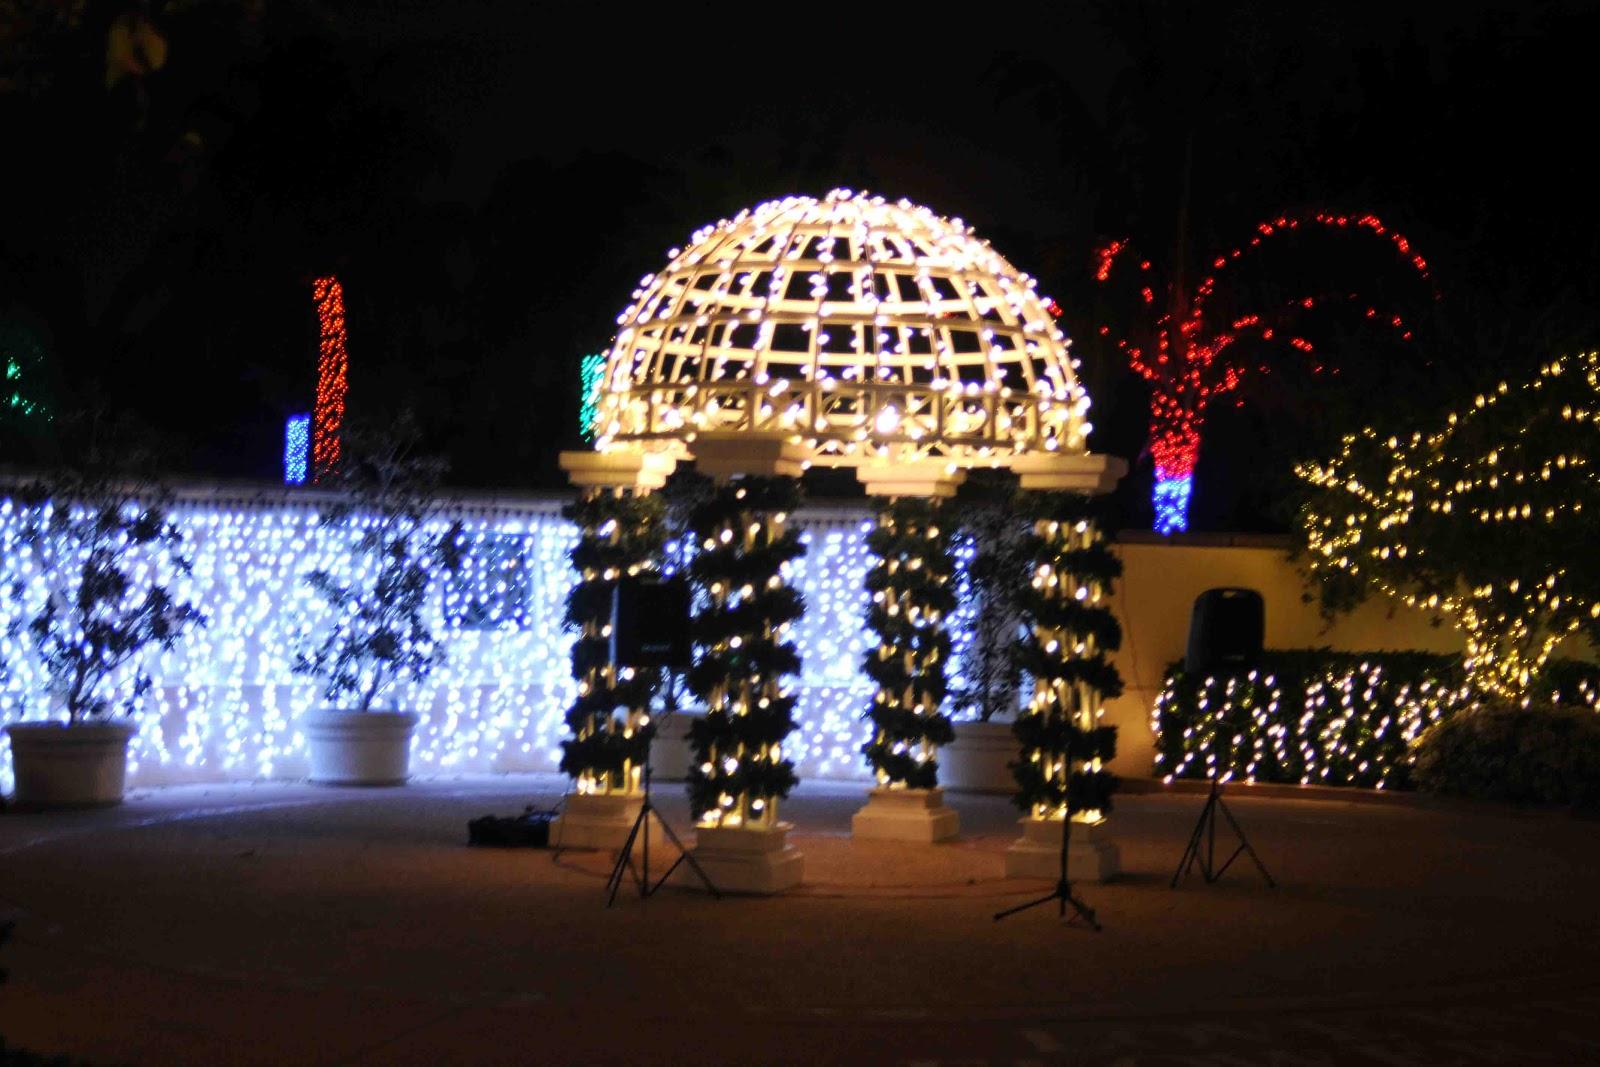 Gonna stuff a chicken florida botanical gardens holiday - Florida botanical gardens christmas lights ...